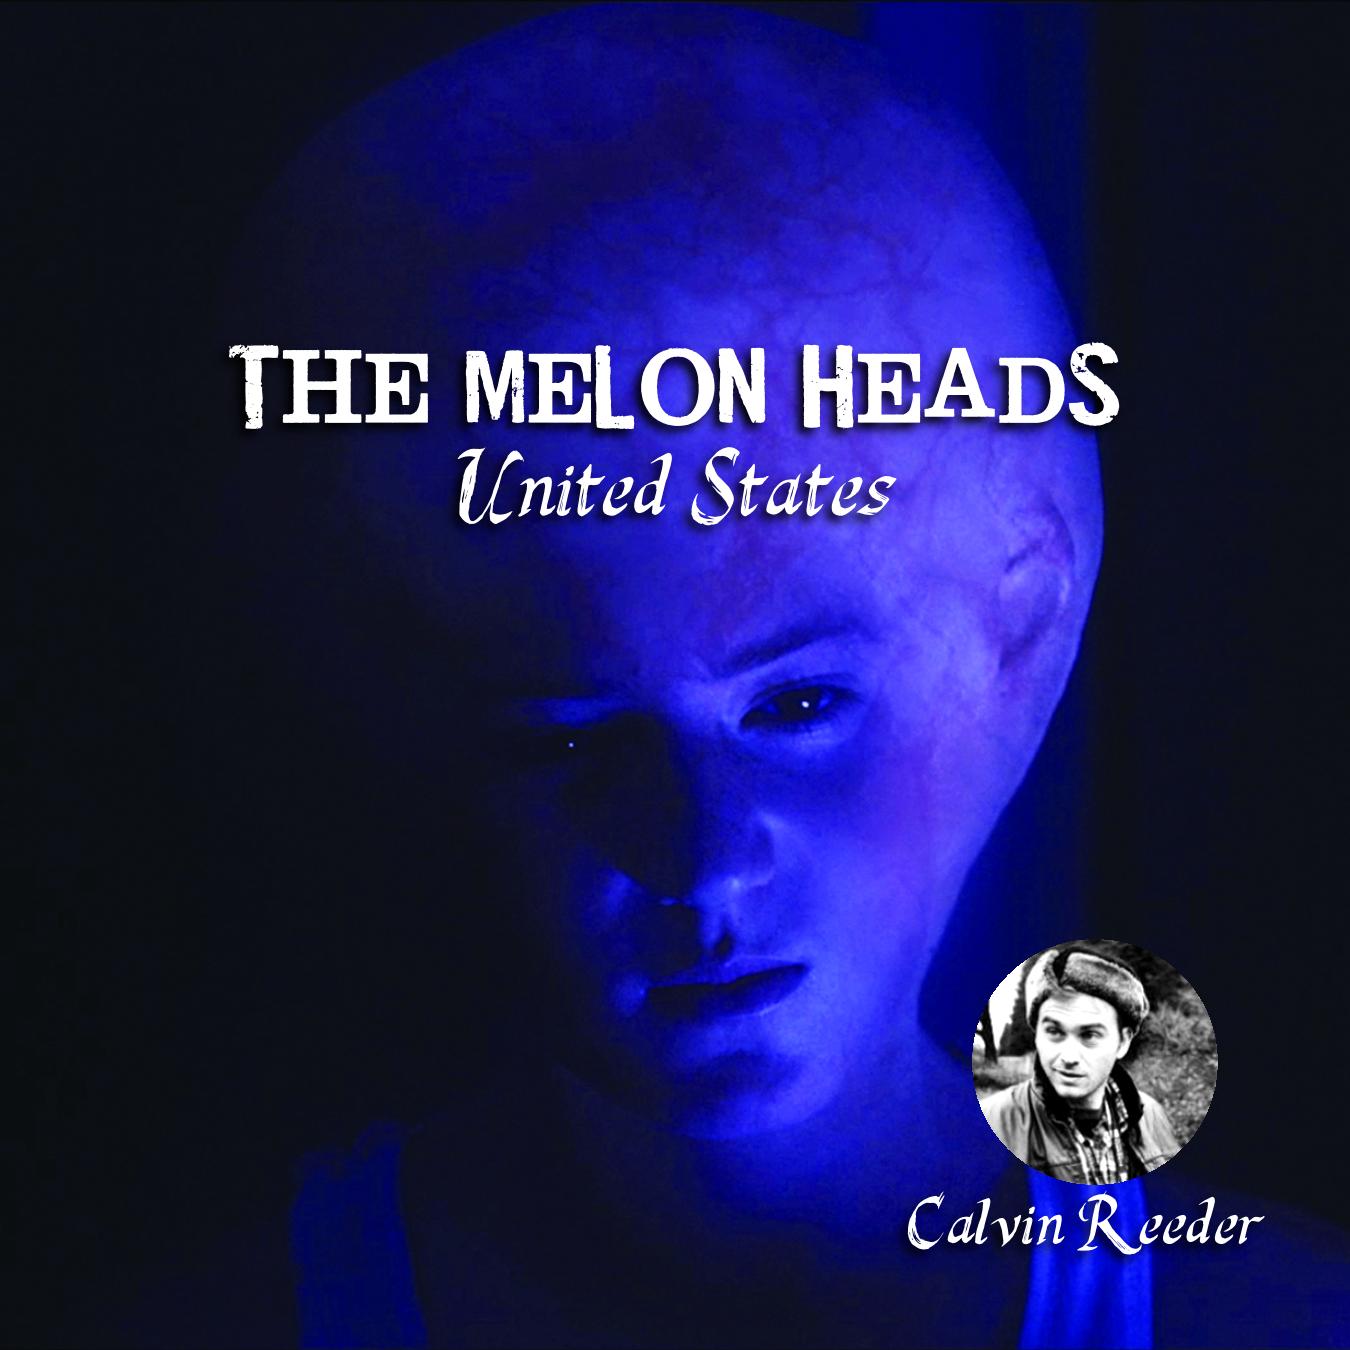 Fgte Usa The Melon Heads Field Guide Alamo Drafthouse Cinema Urban Legends